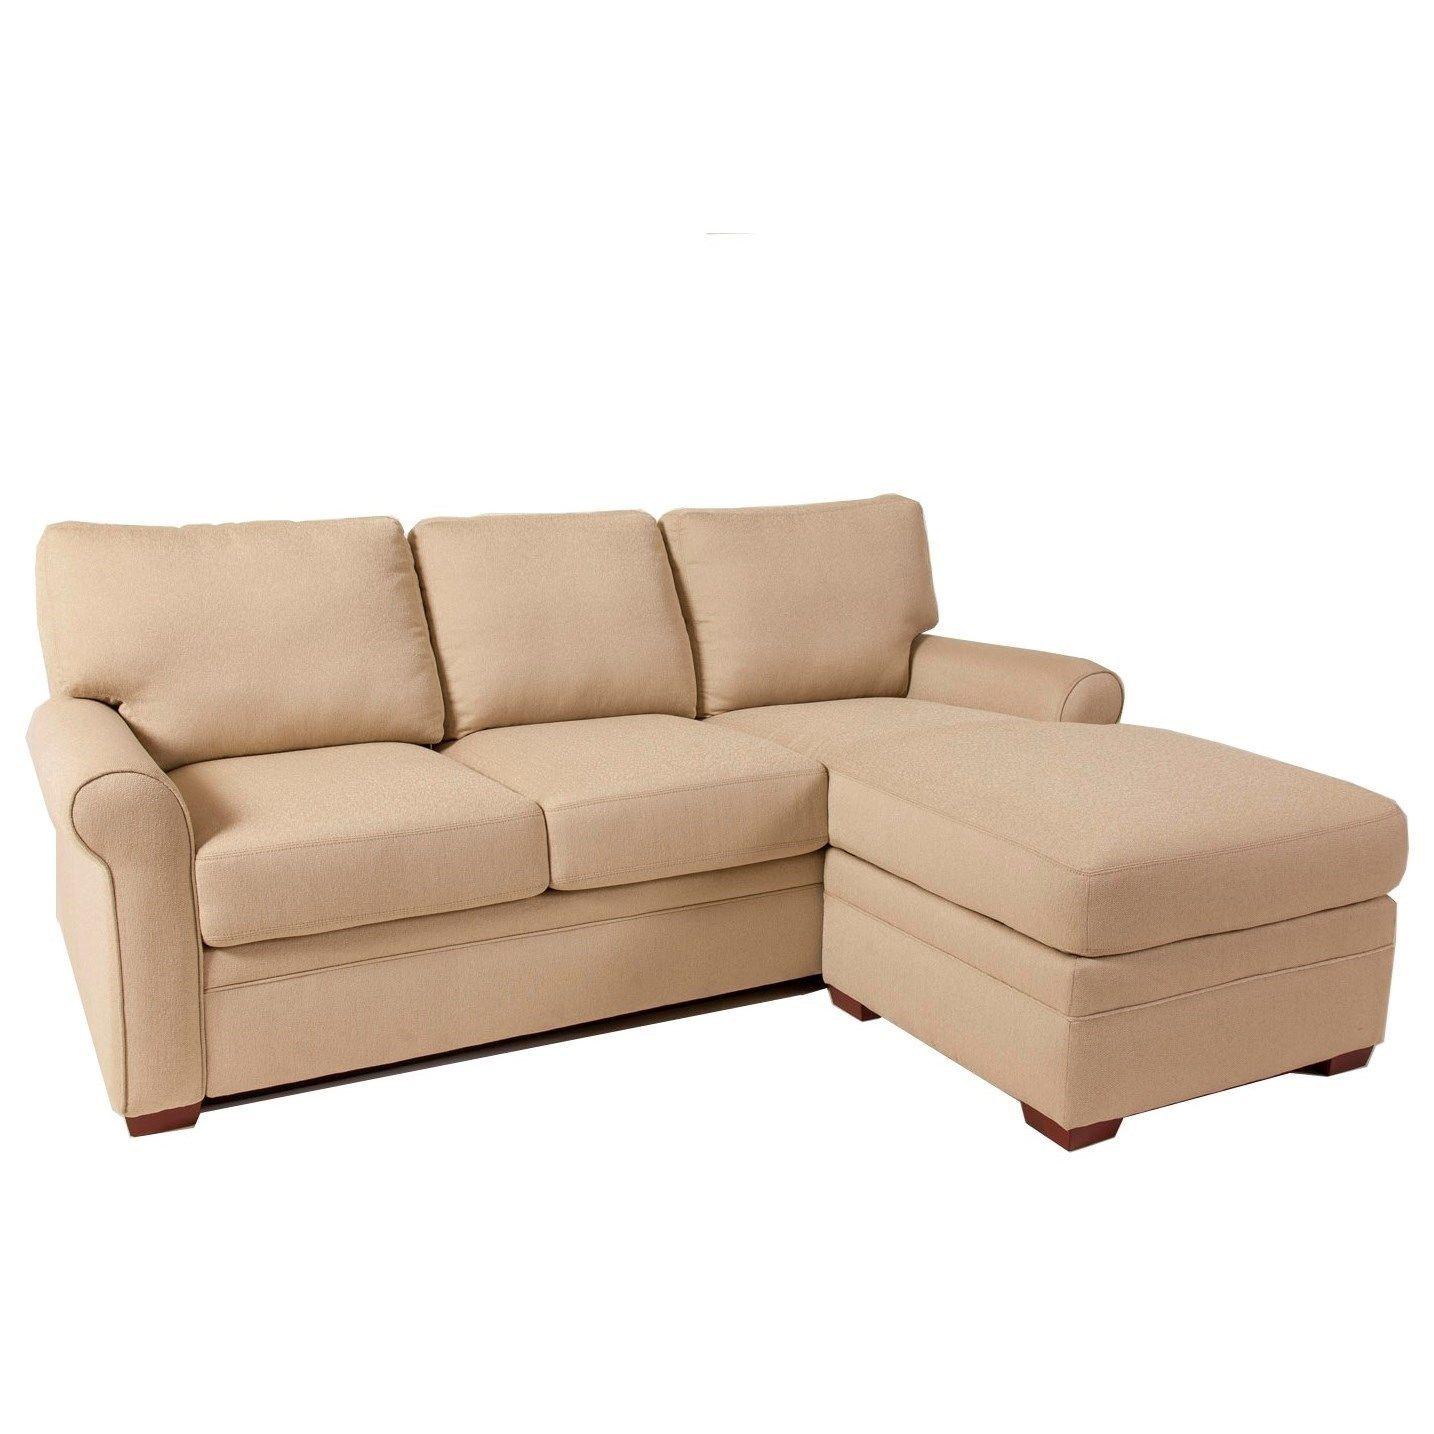 American Leather Sofa Bed American Leather Comfort Sleeper Sofa